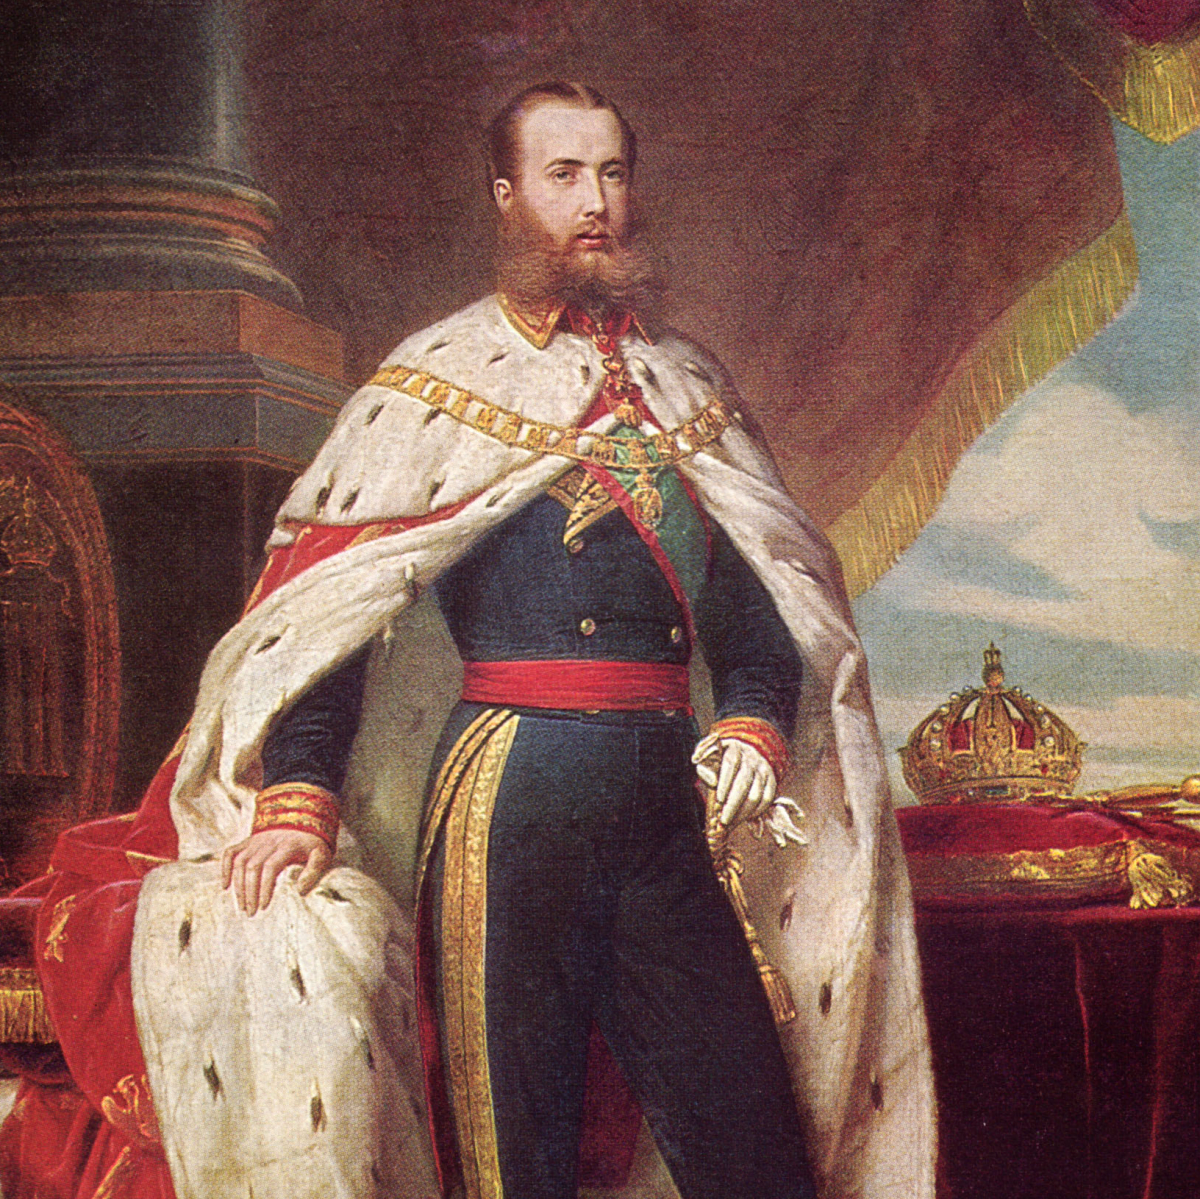 Maximilan, Emperor of Mexico